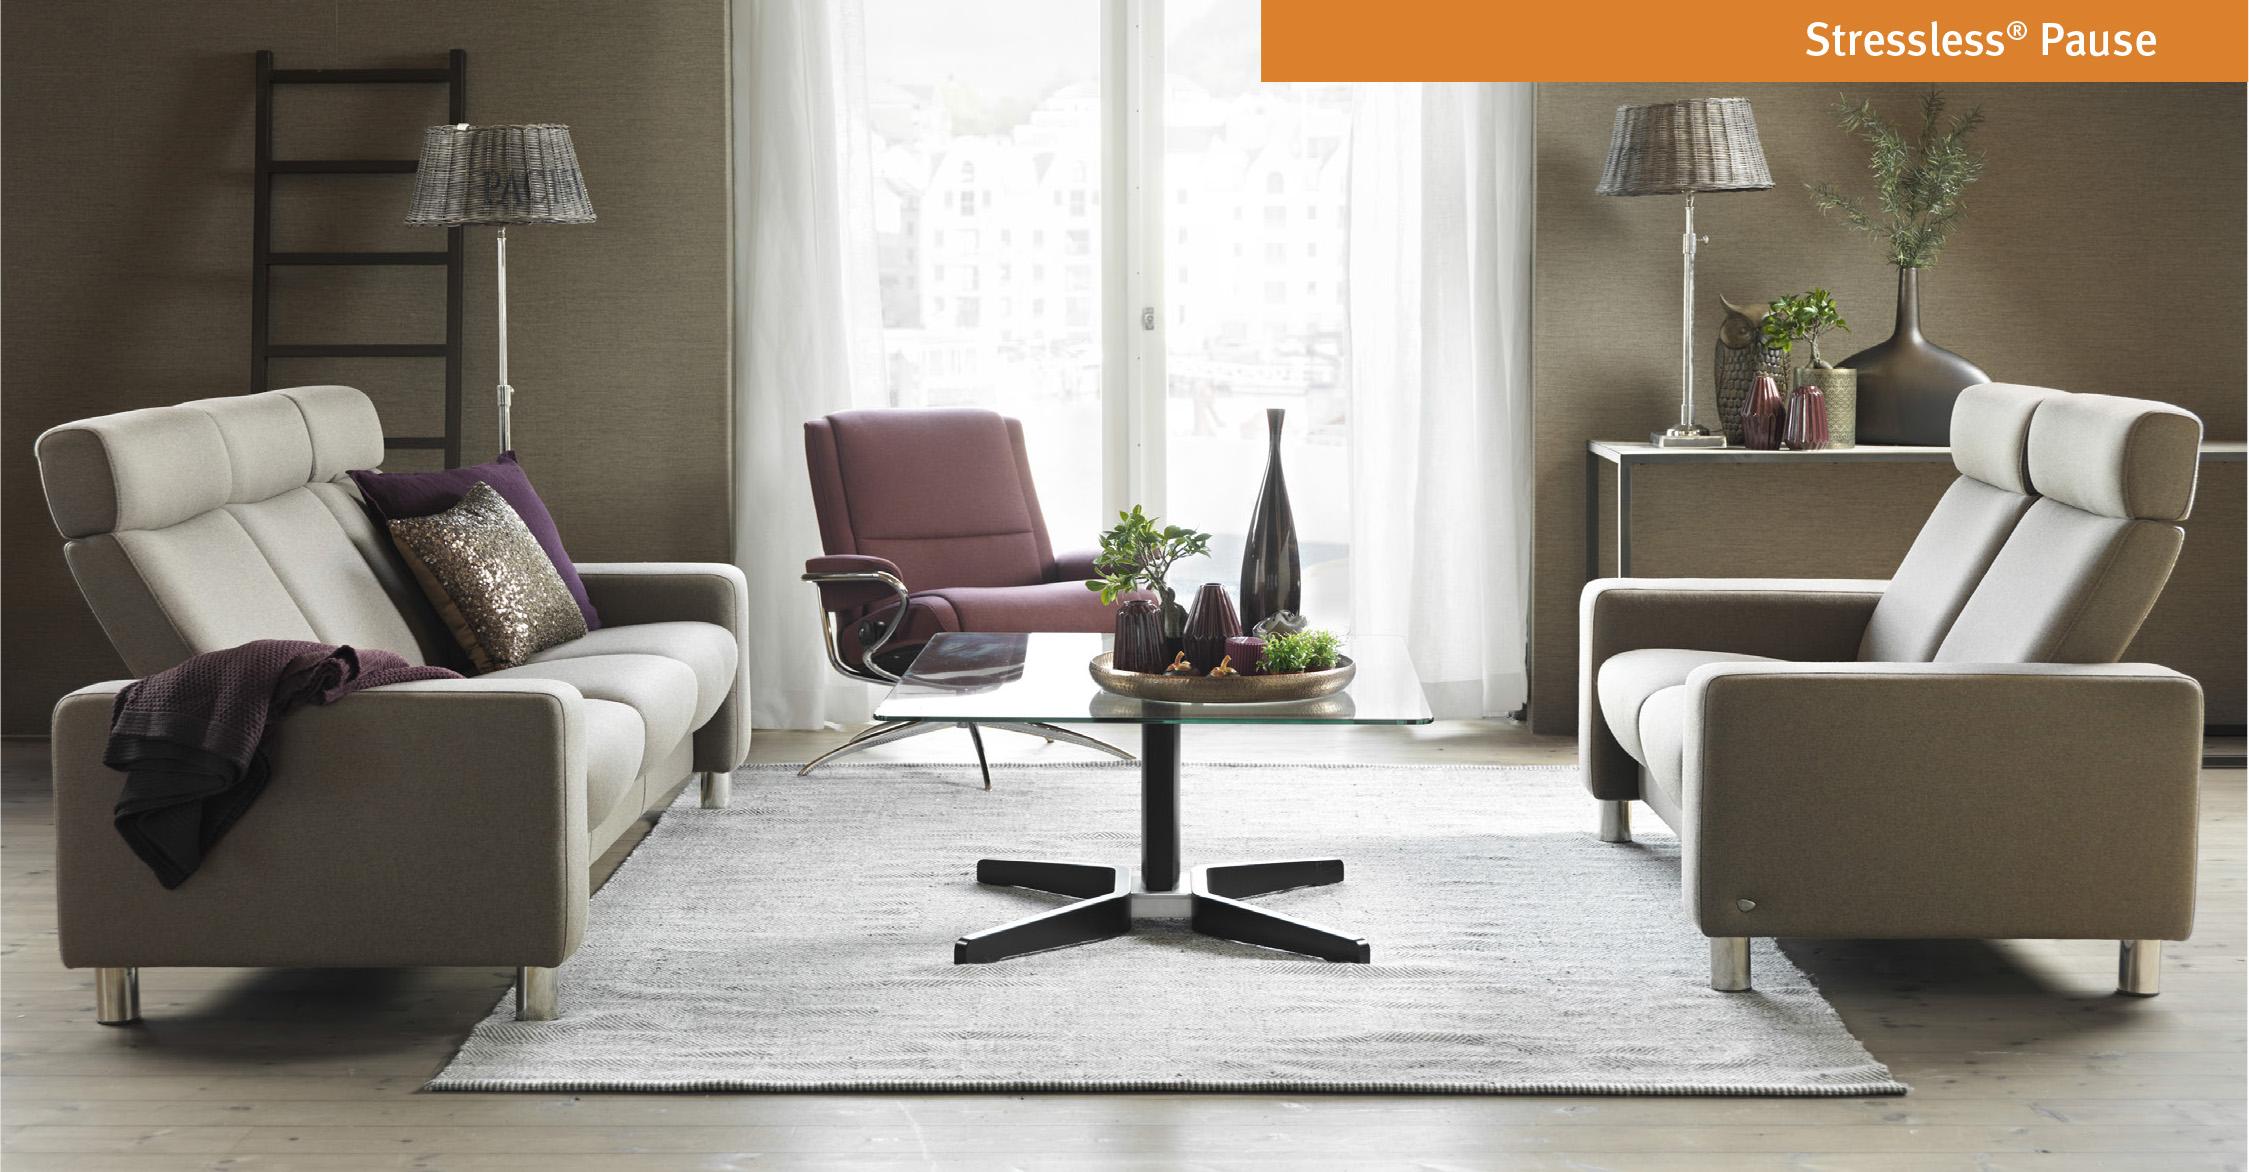 Surprising Ekornes Stressless Pause Sofa Ekornes Stressless Pause Pdpeps Interior Chair Design Pdpepsorg